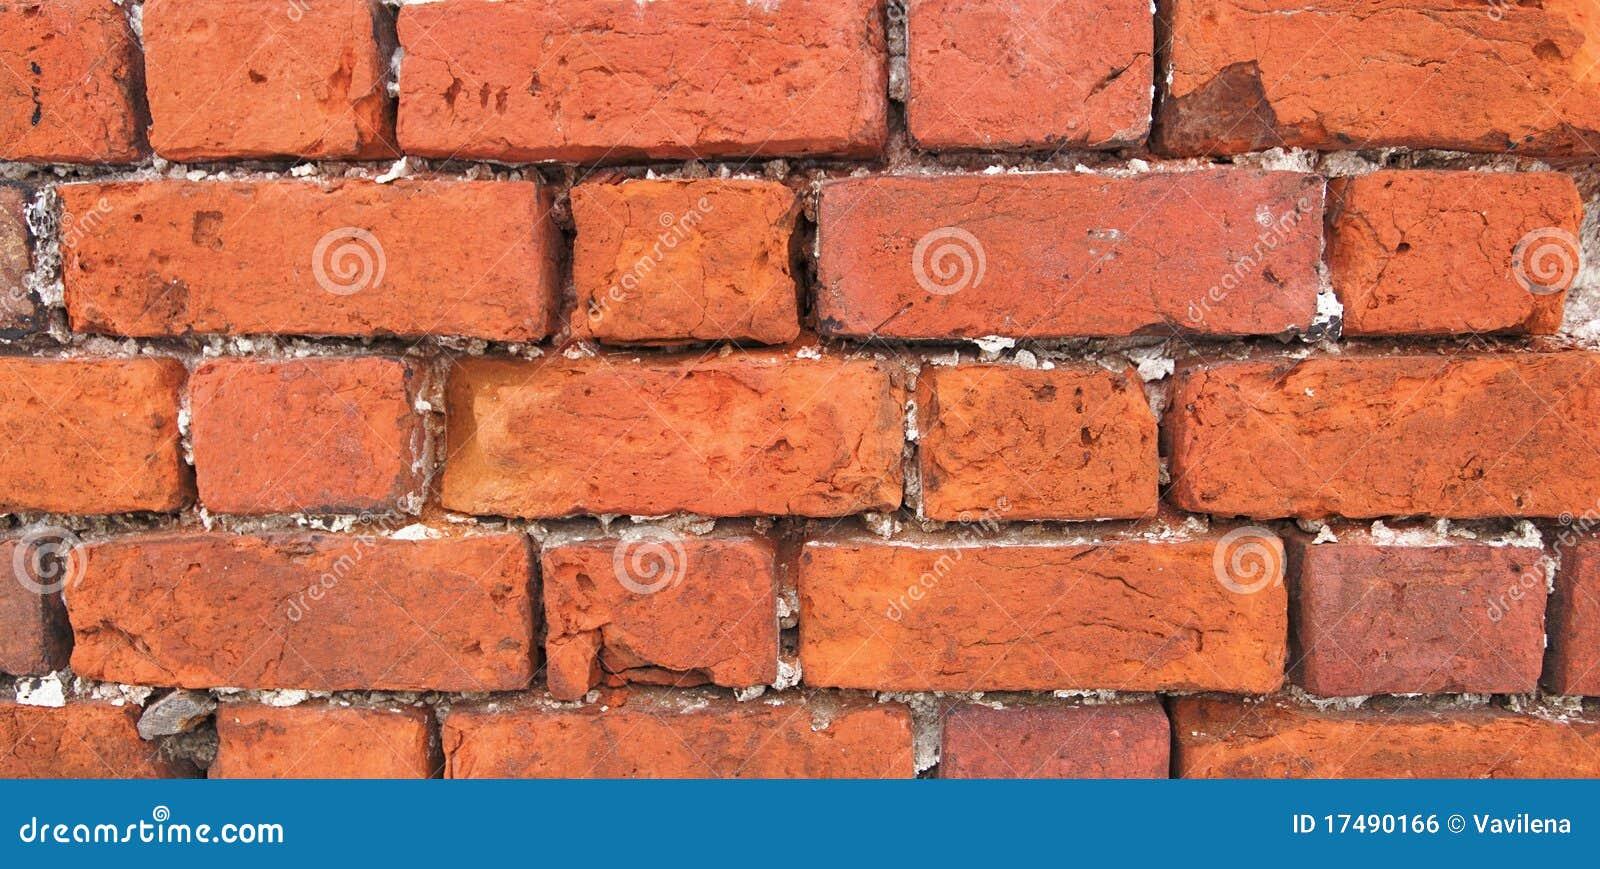 Bricklaying business plan